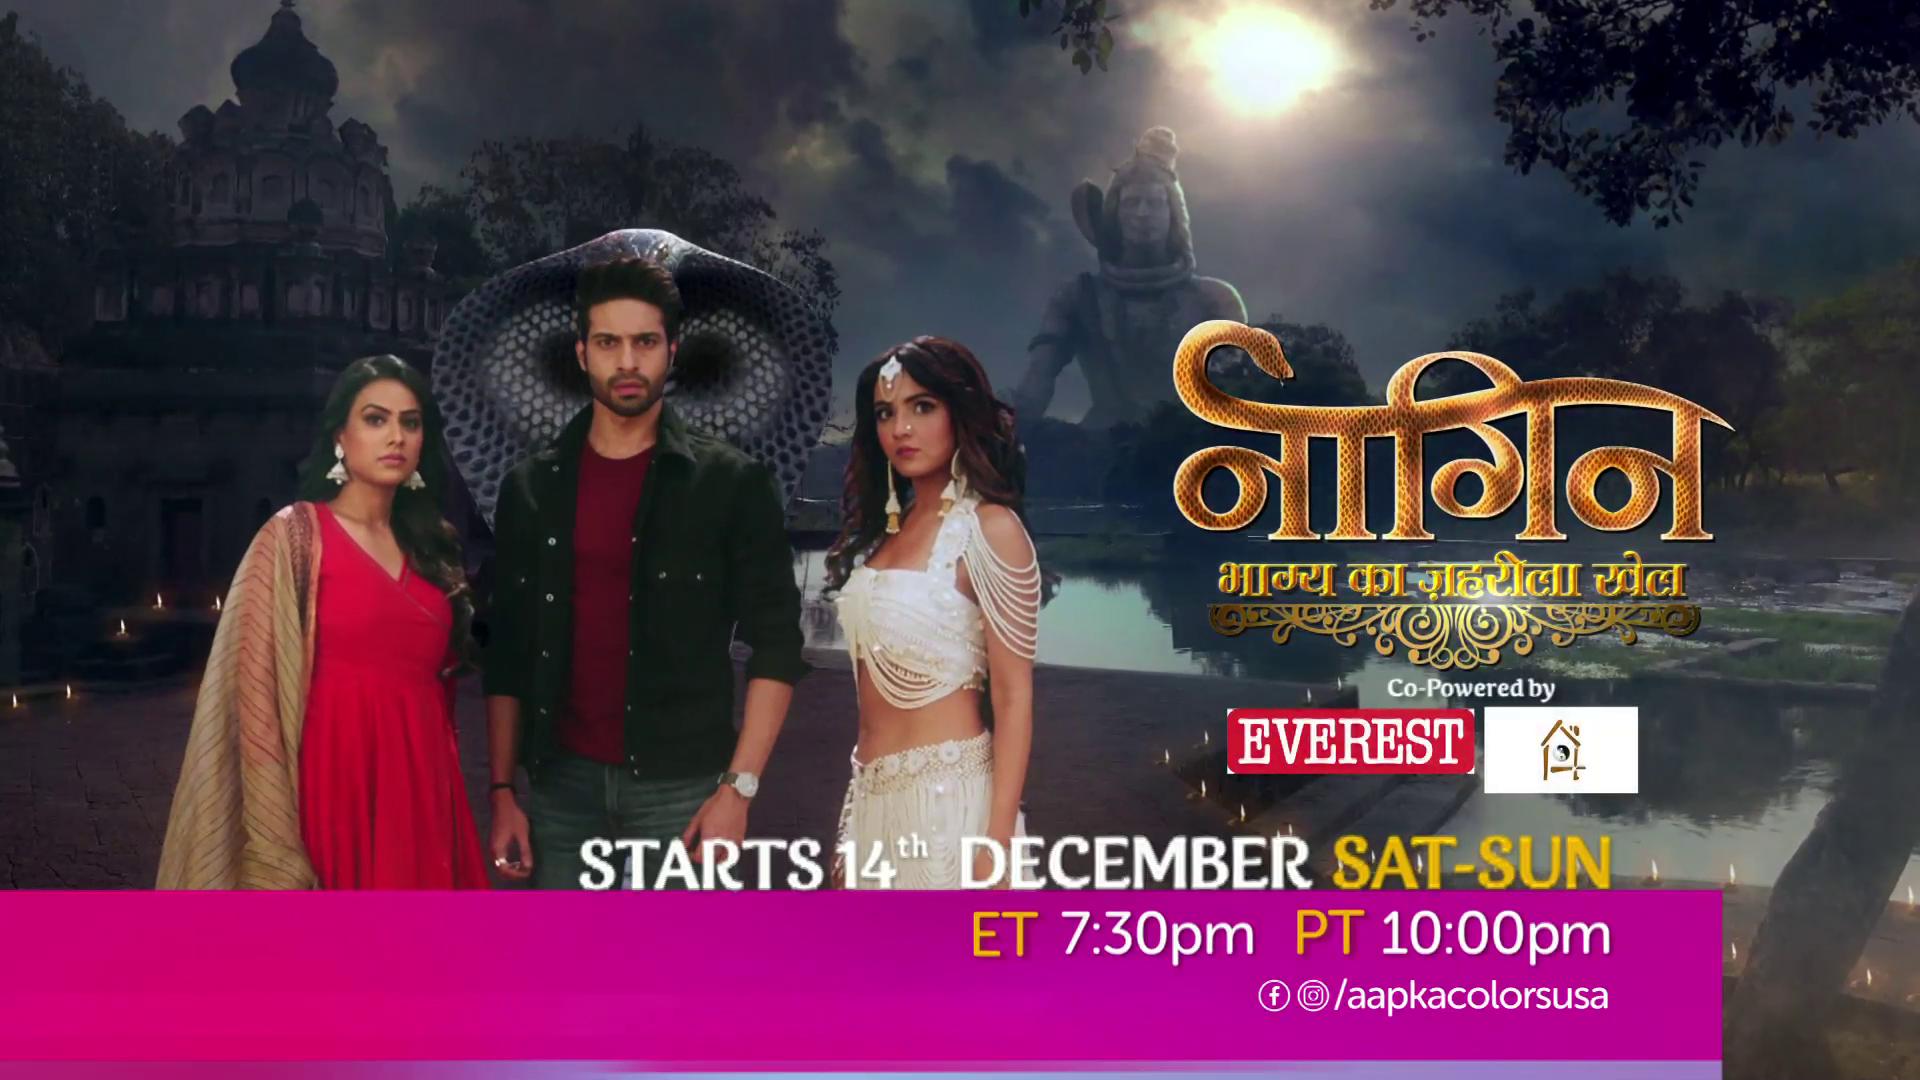 Naagin – bhagya ka zehrila khel Starts 14th Dec Sat-Sun 7:30pm ET/10pm PT